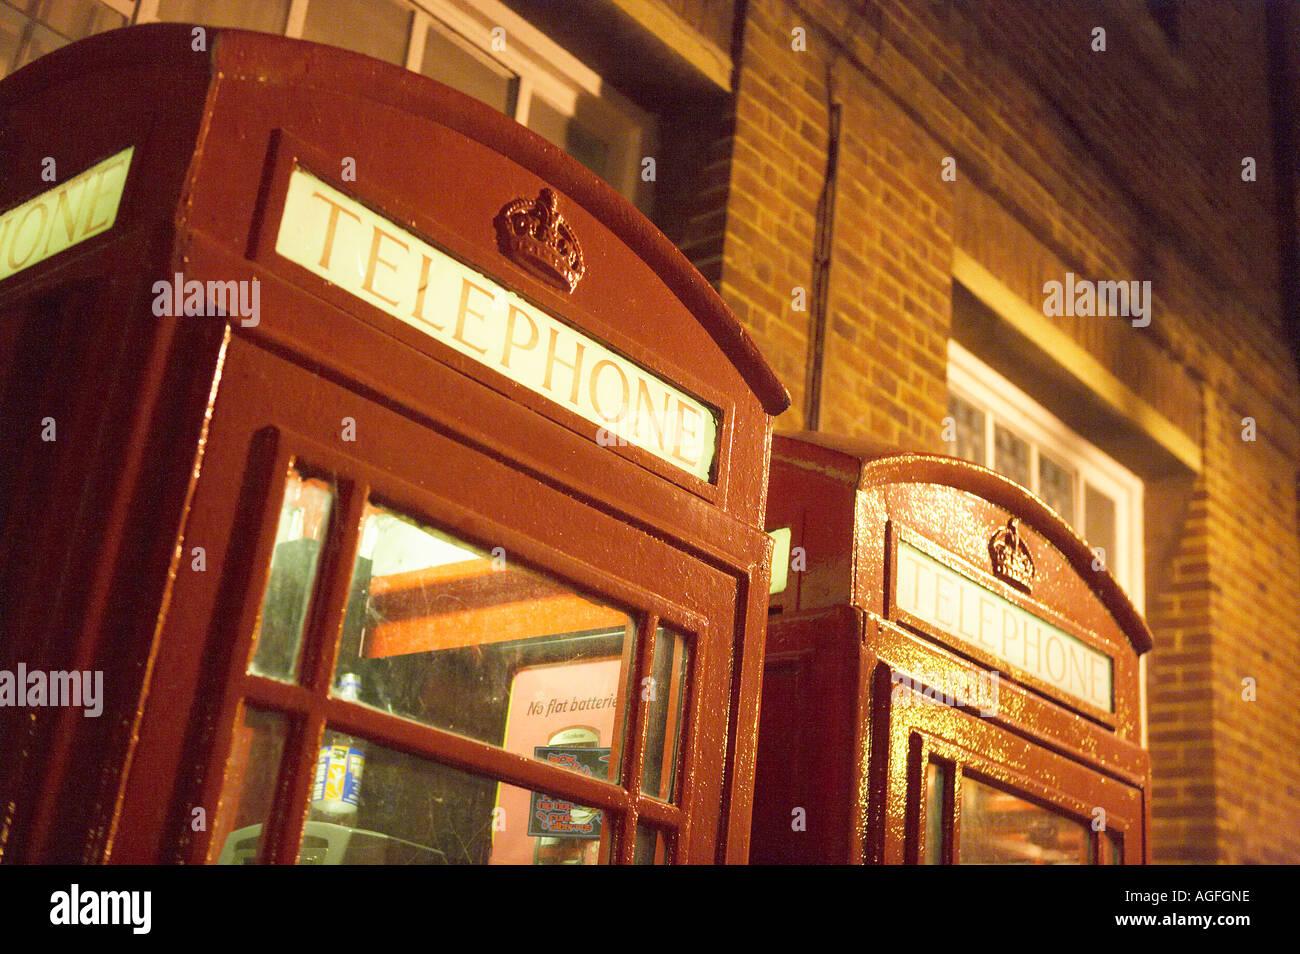 TRADITIONAL RED ENGLISH TELEPHONE KIOSK AT NIGHT CANTERBURY KENT ENGLAND - Stock Image